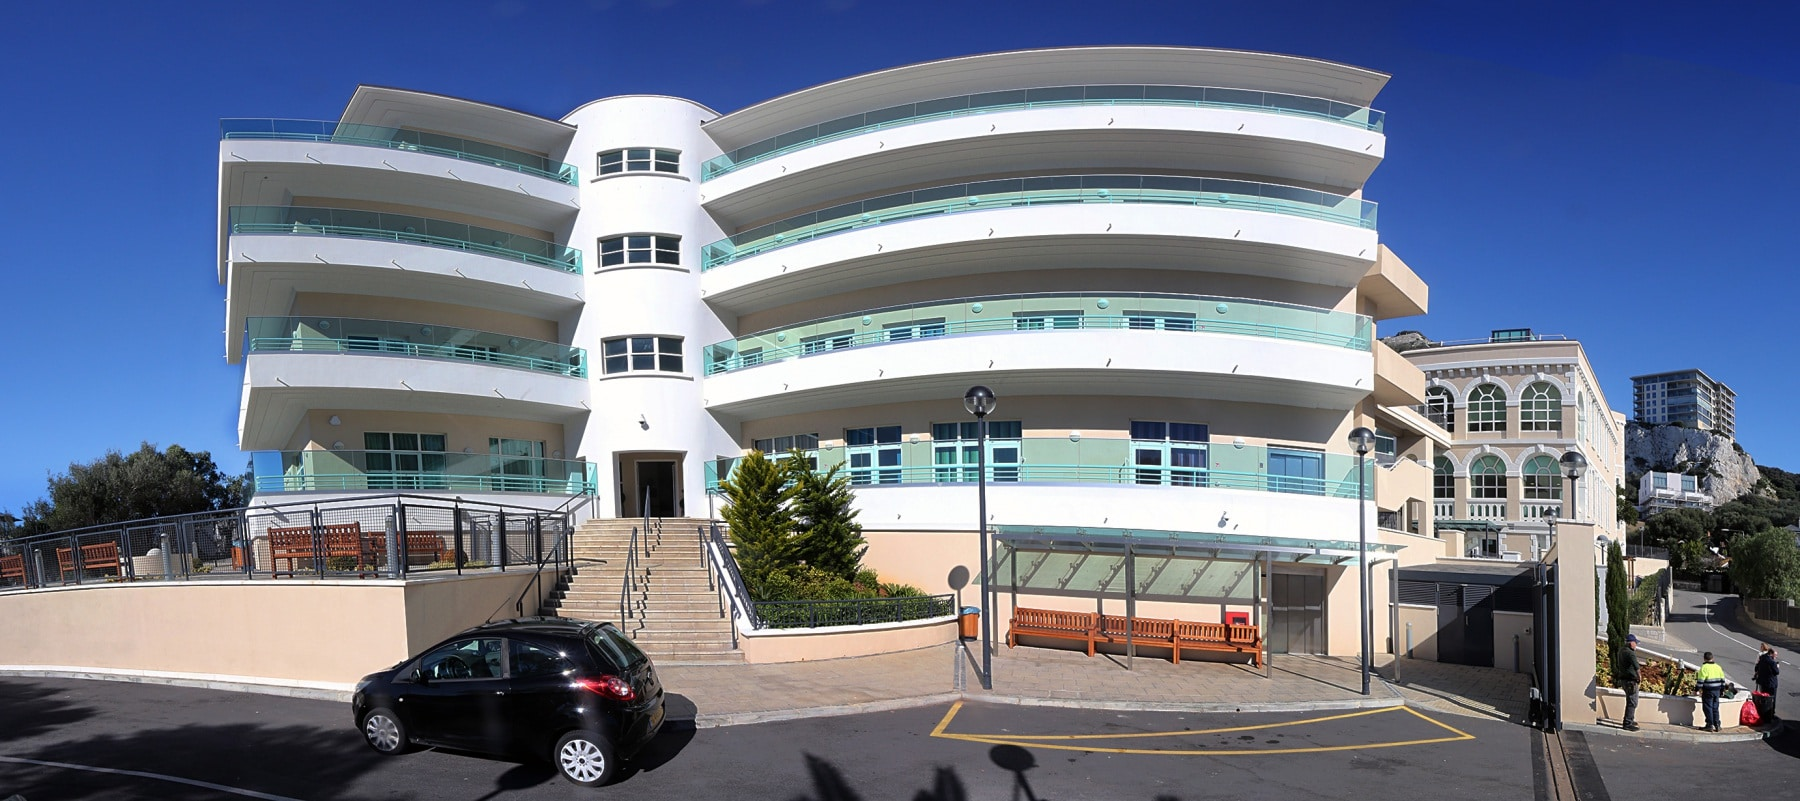 dementia-day-centre-panorama3_32228020981_o